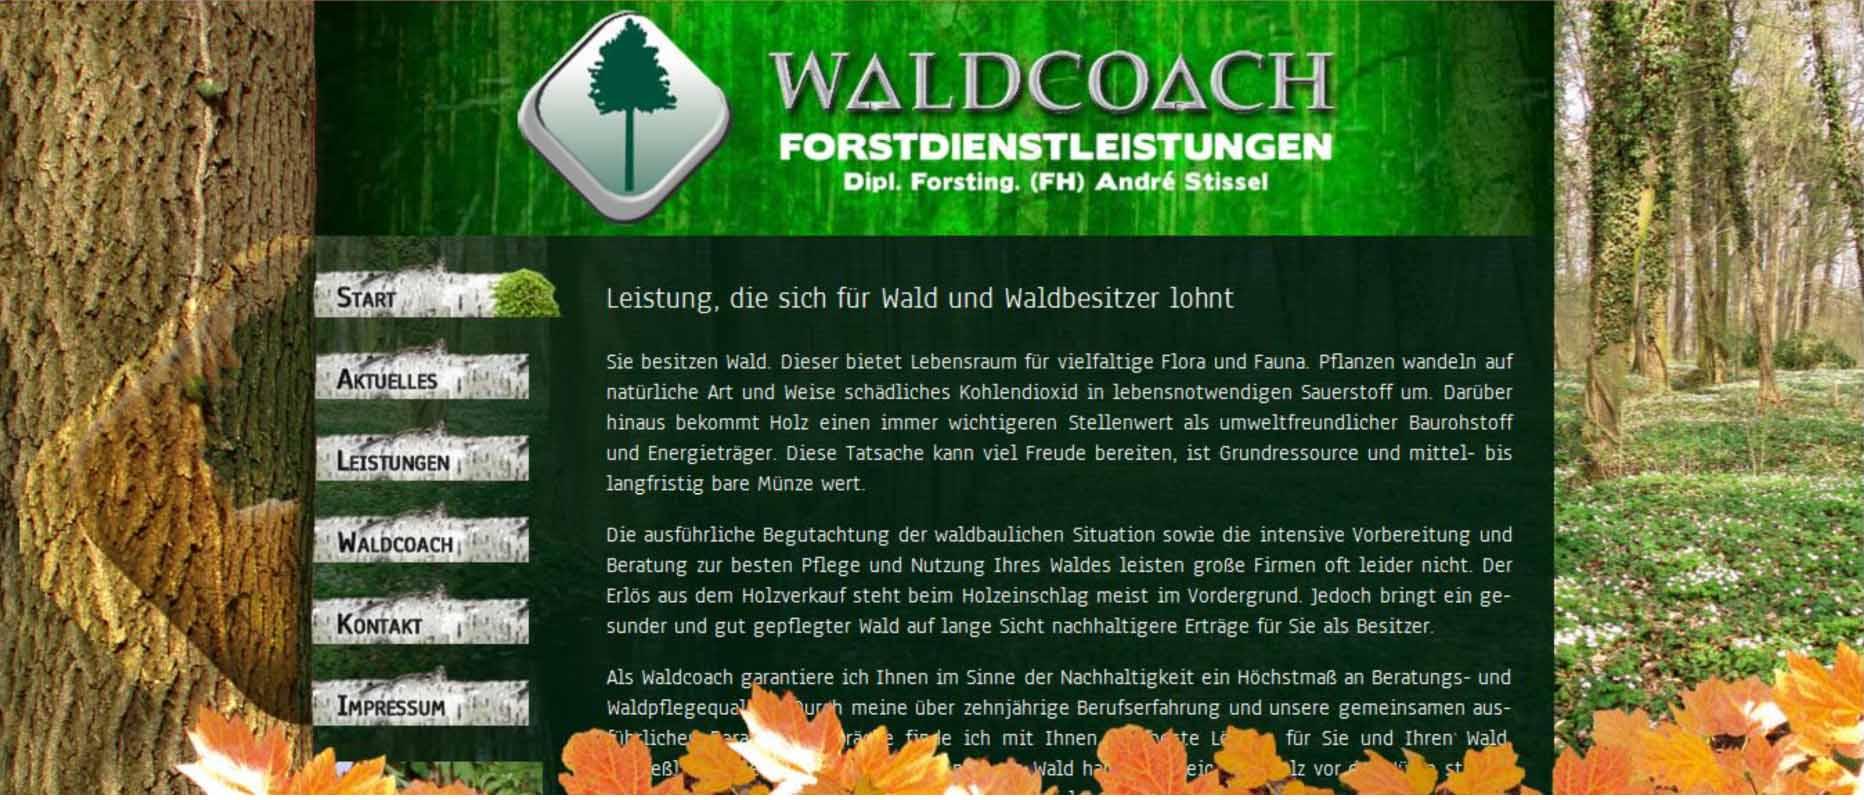 Waldcoach